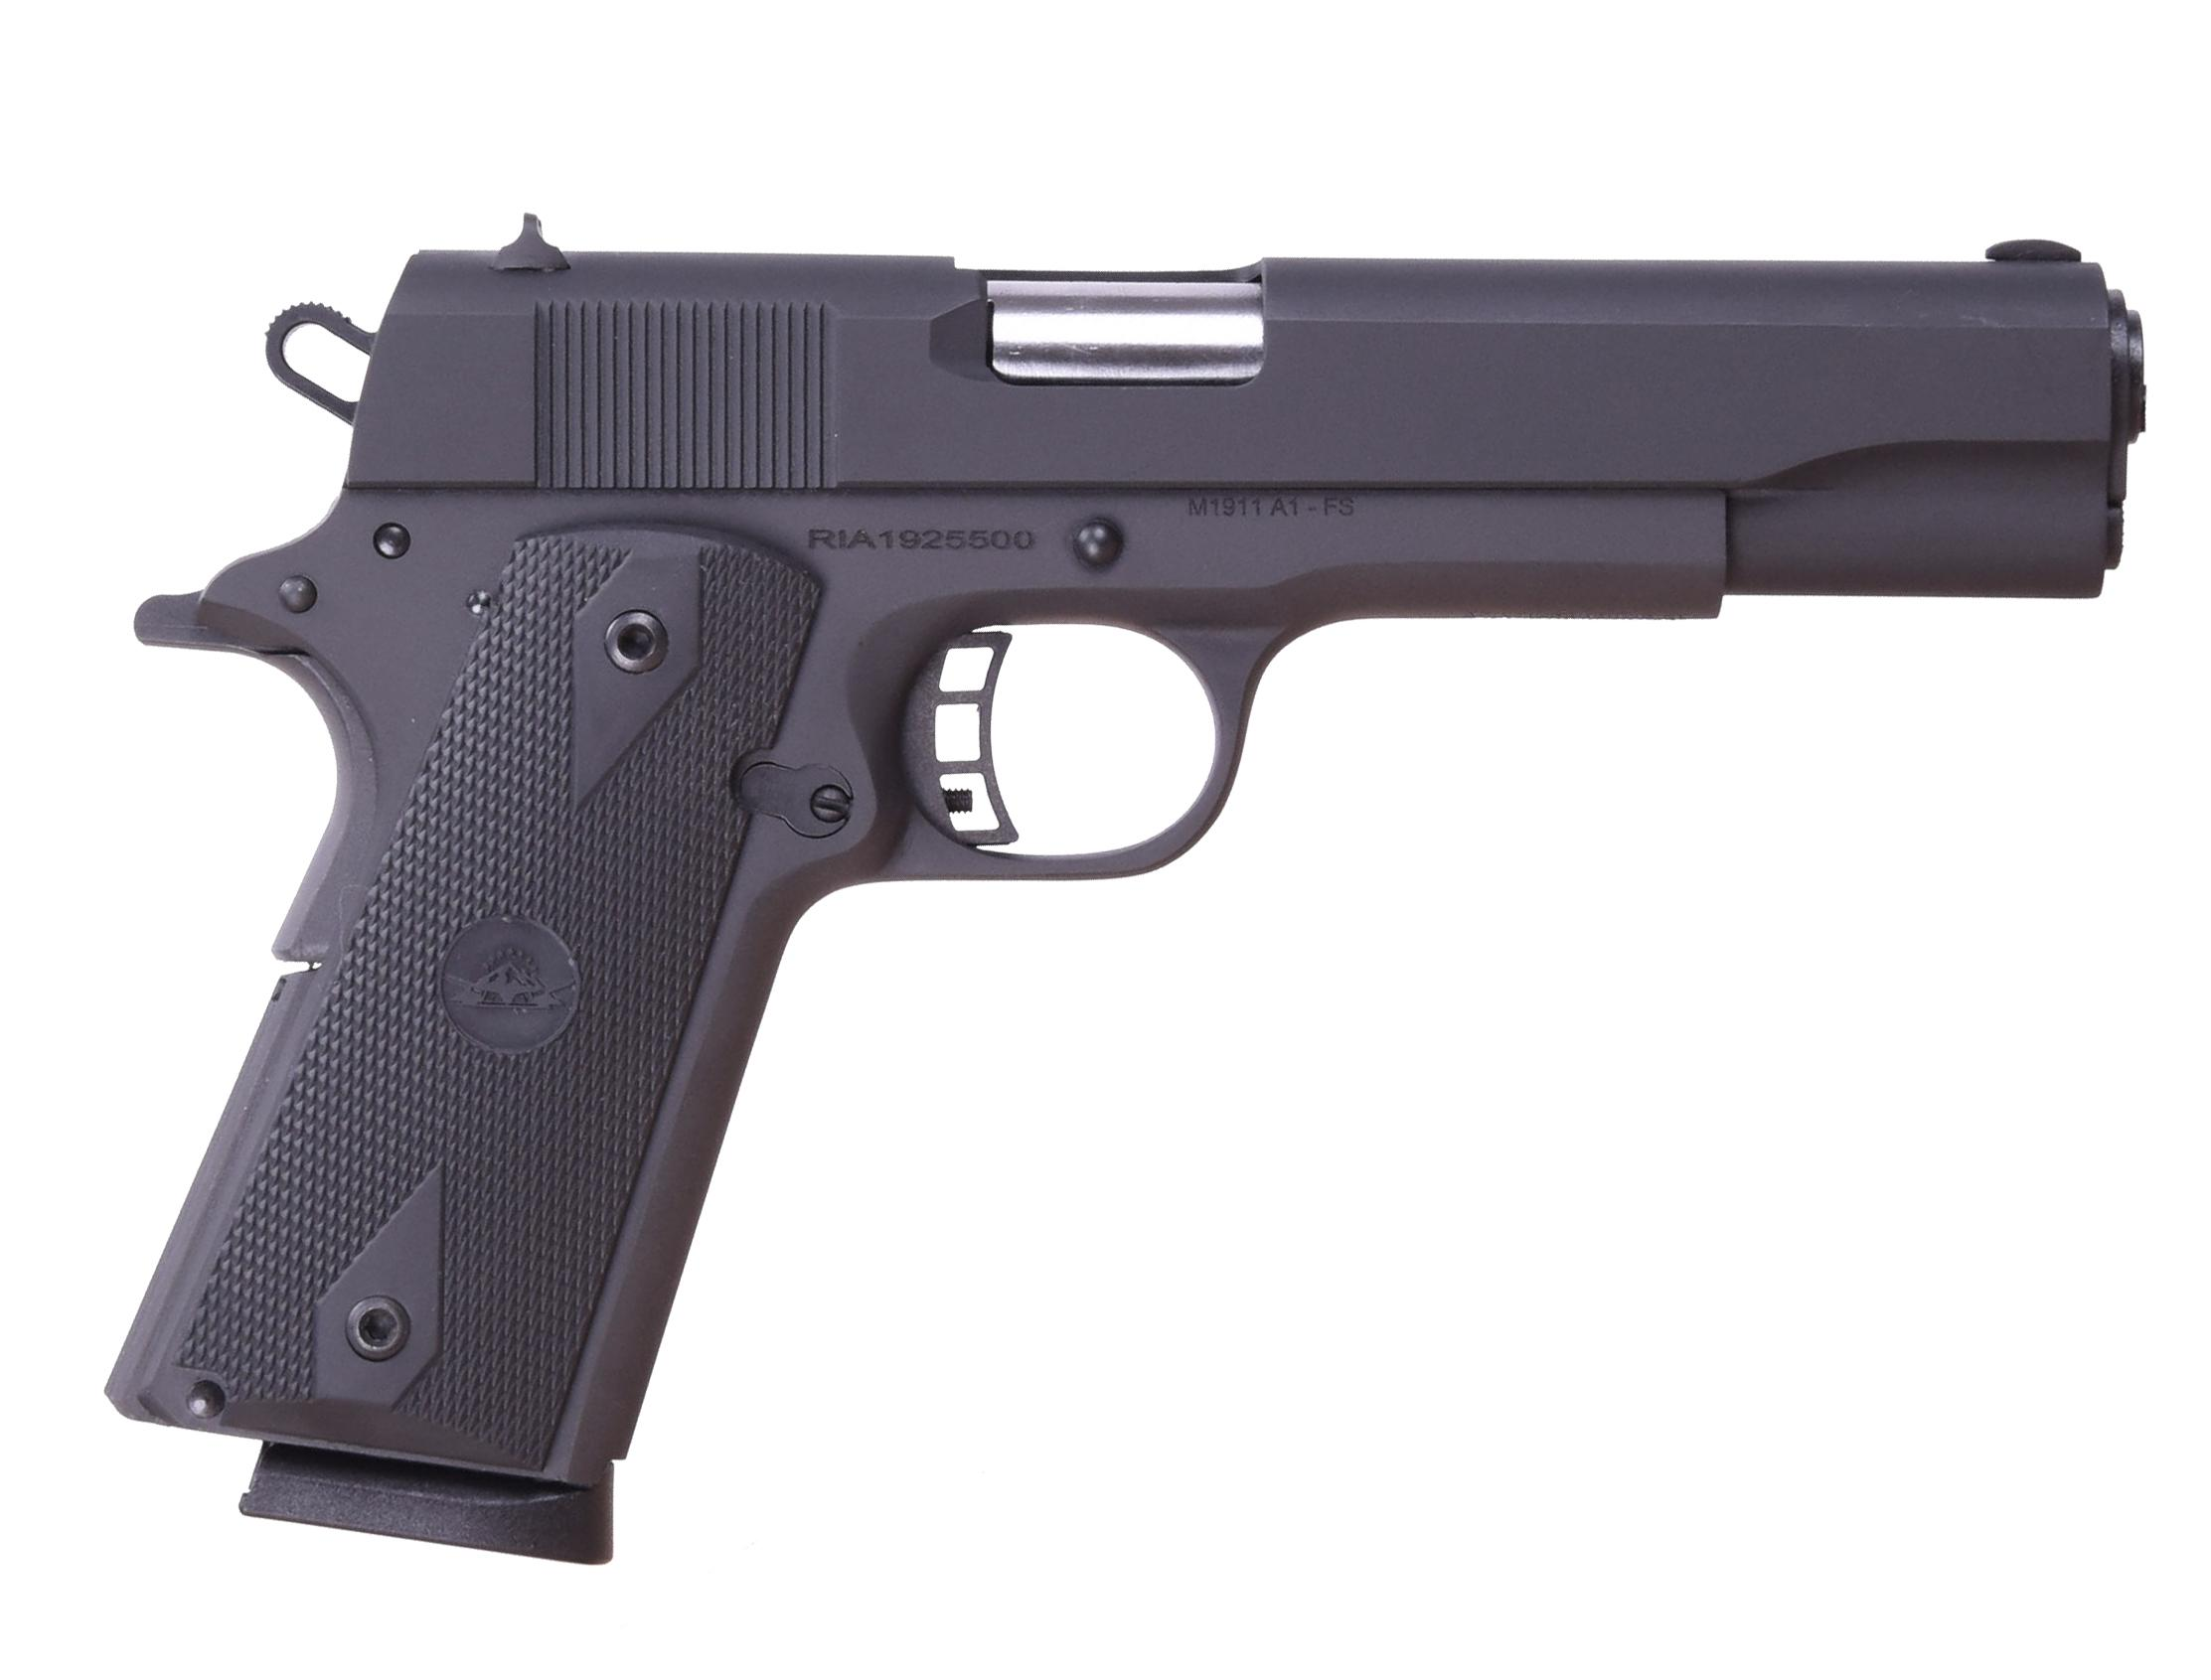 M1911-A1 GI TACT 1911 45ACP 5 -